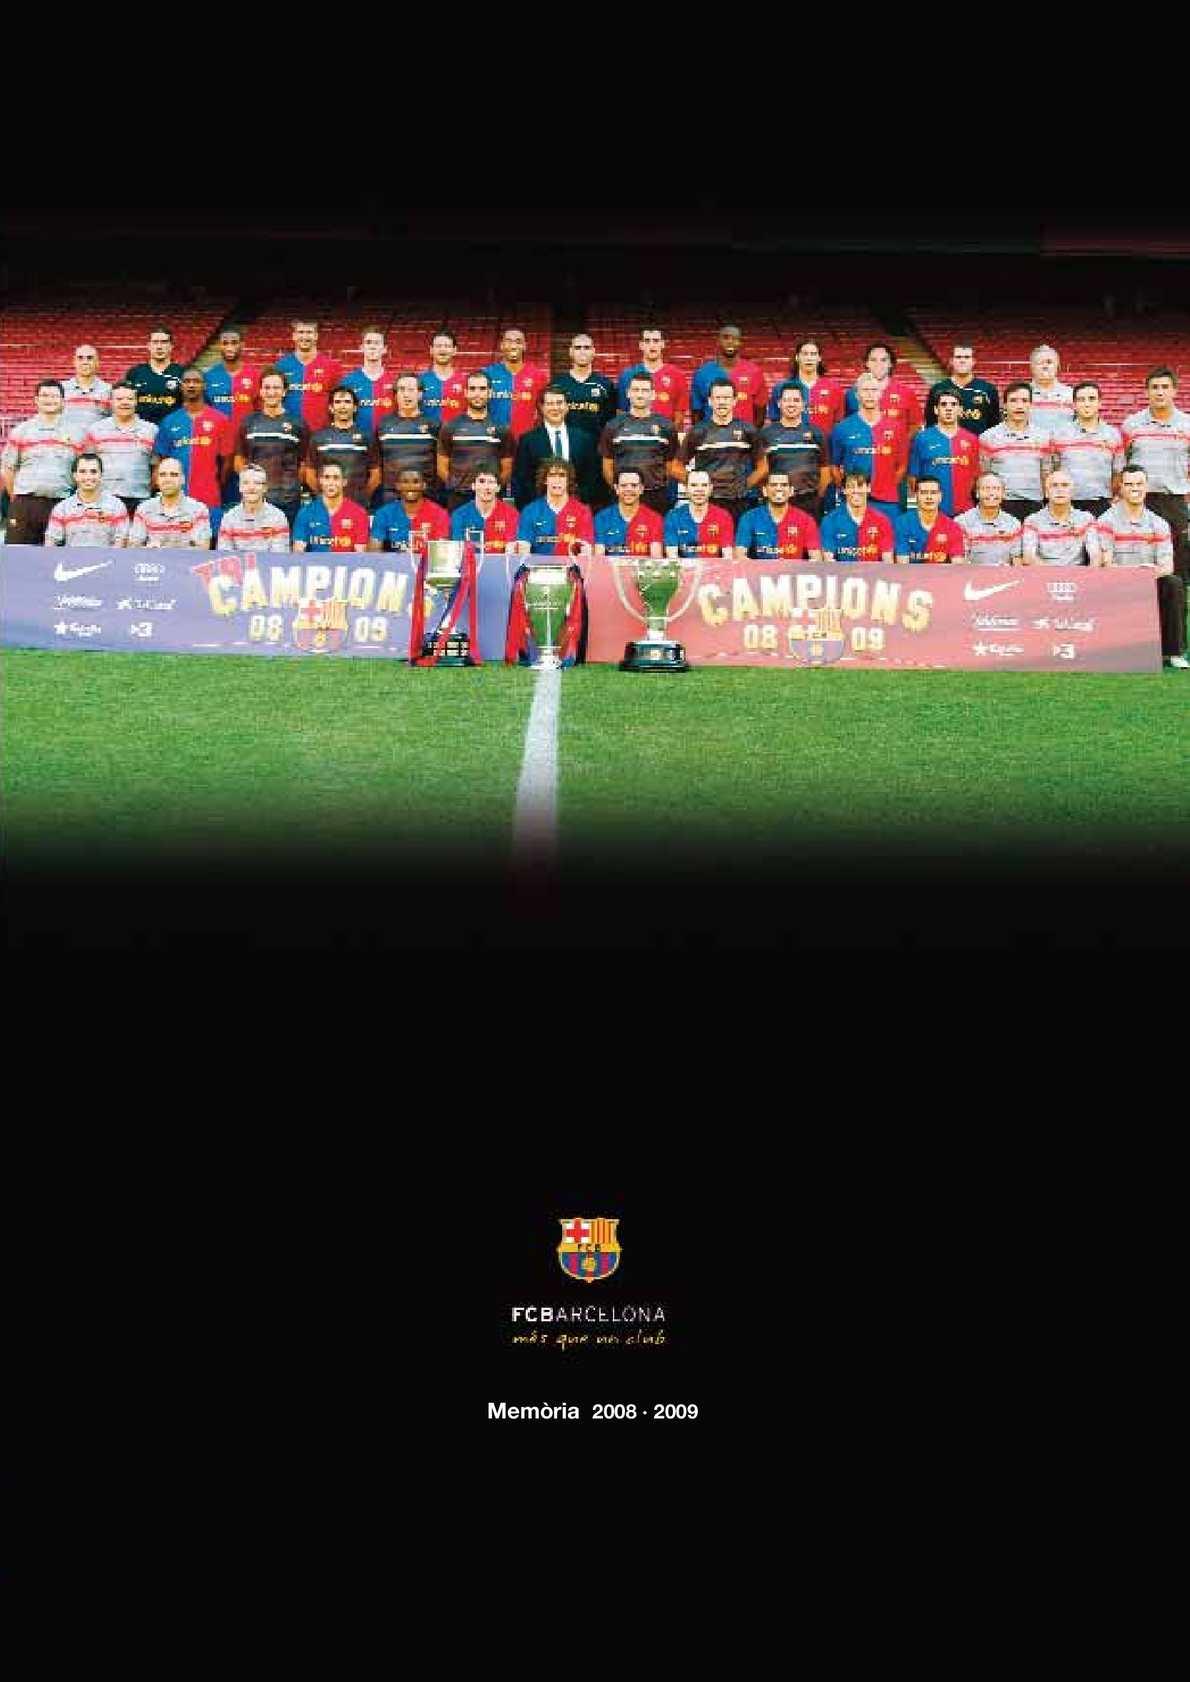 c85ca99b03985 Calaméo - Memorial FC Barcelona 2008 09